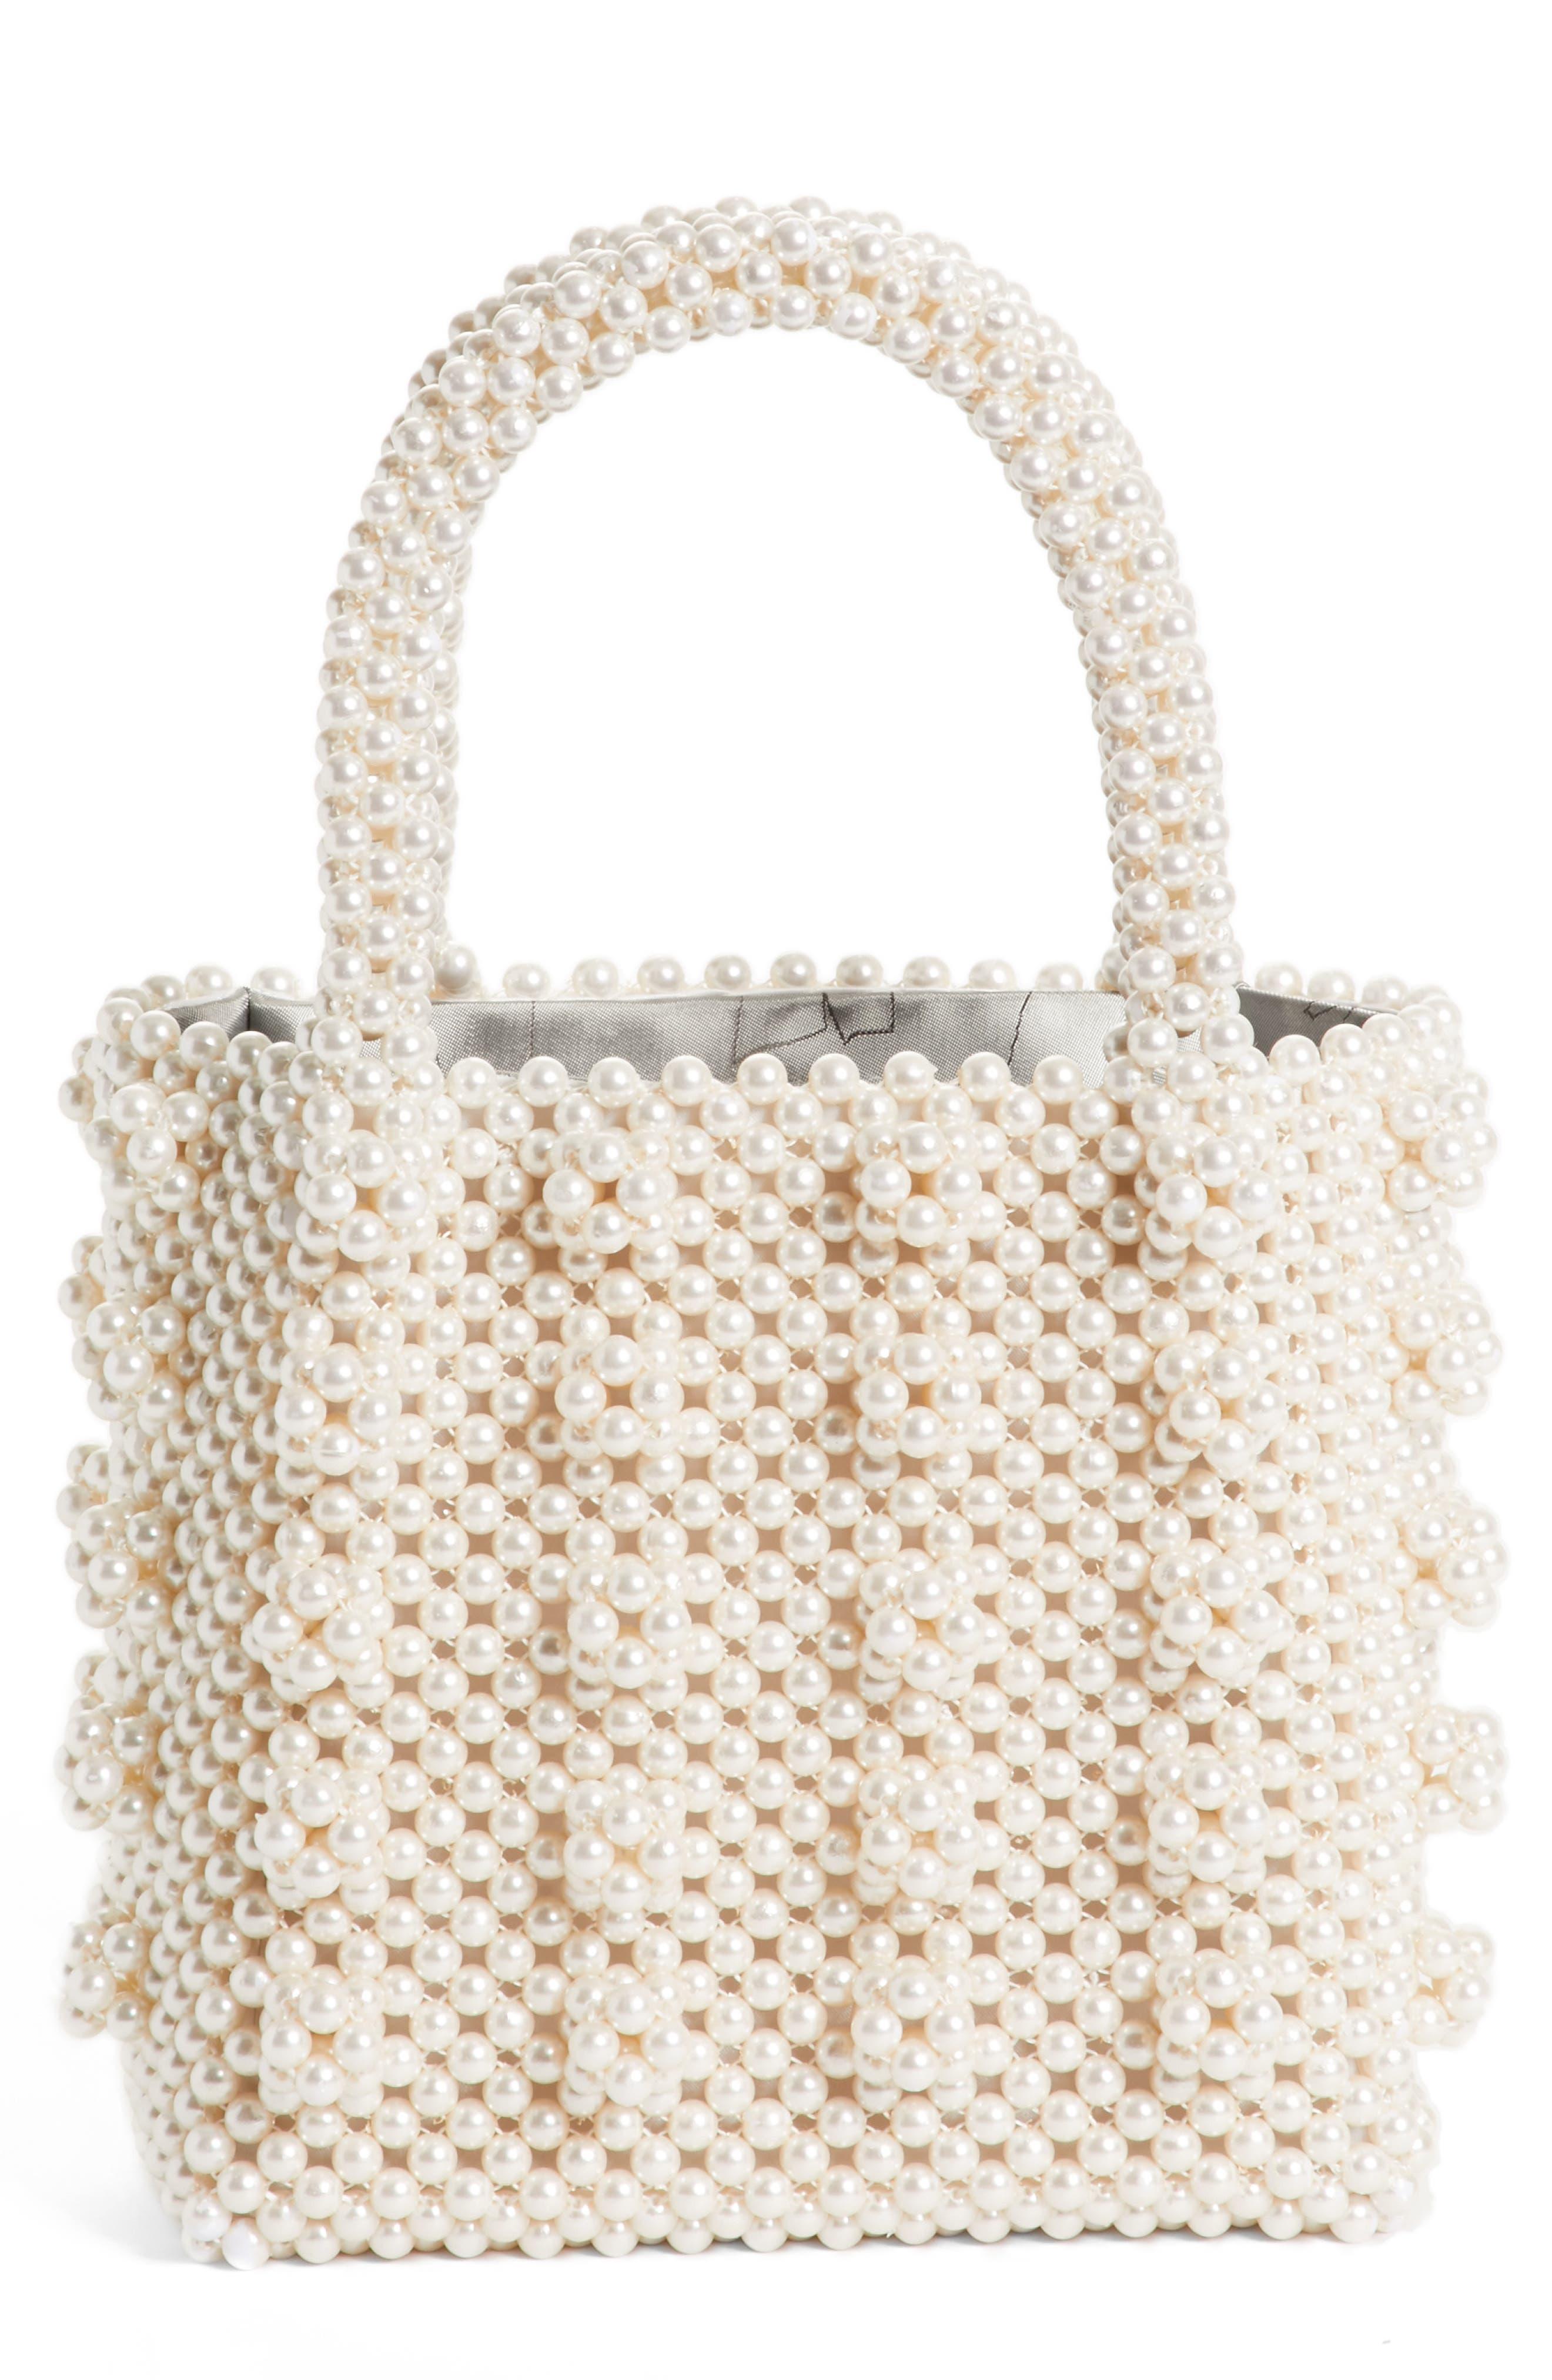 Antonia Small Imitation Pearl Beaded Handbag,                             Main thumbnail 1, color,                             900